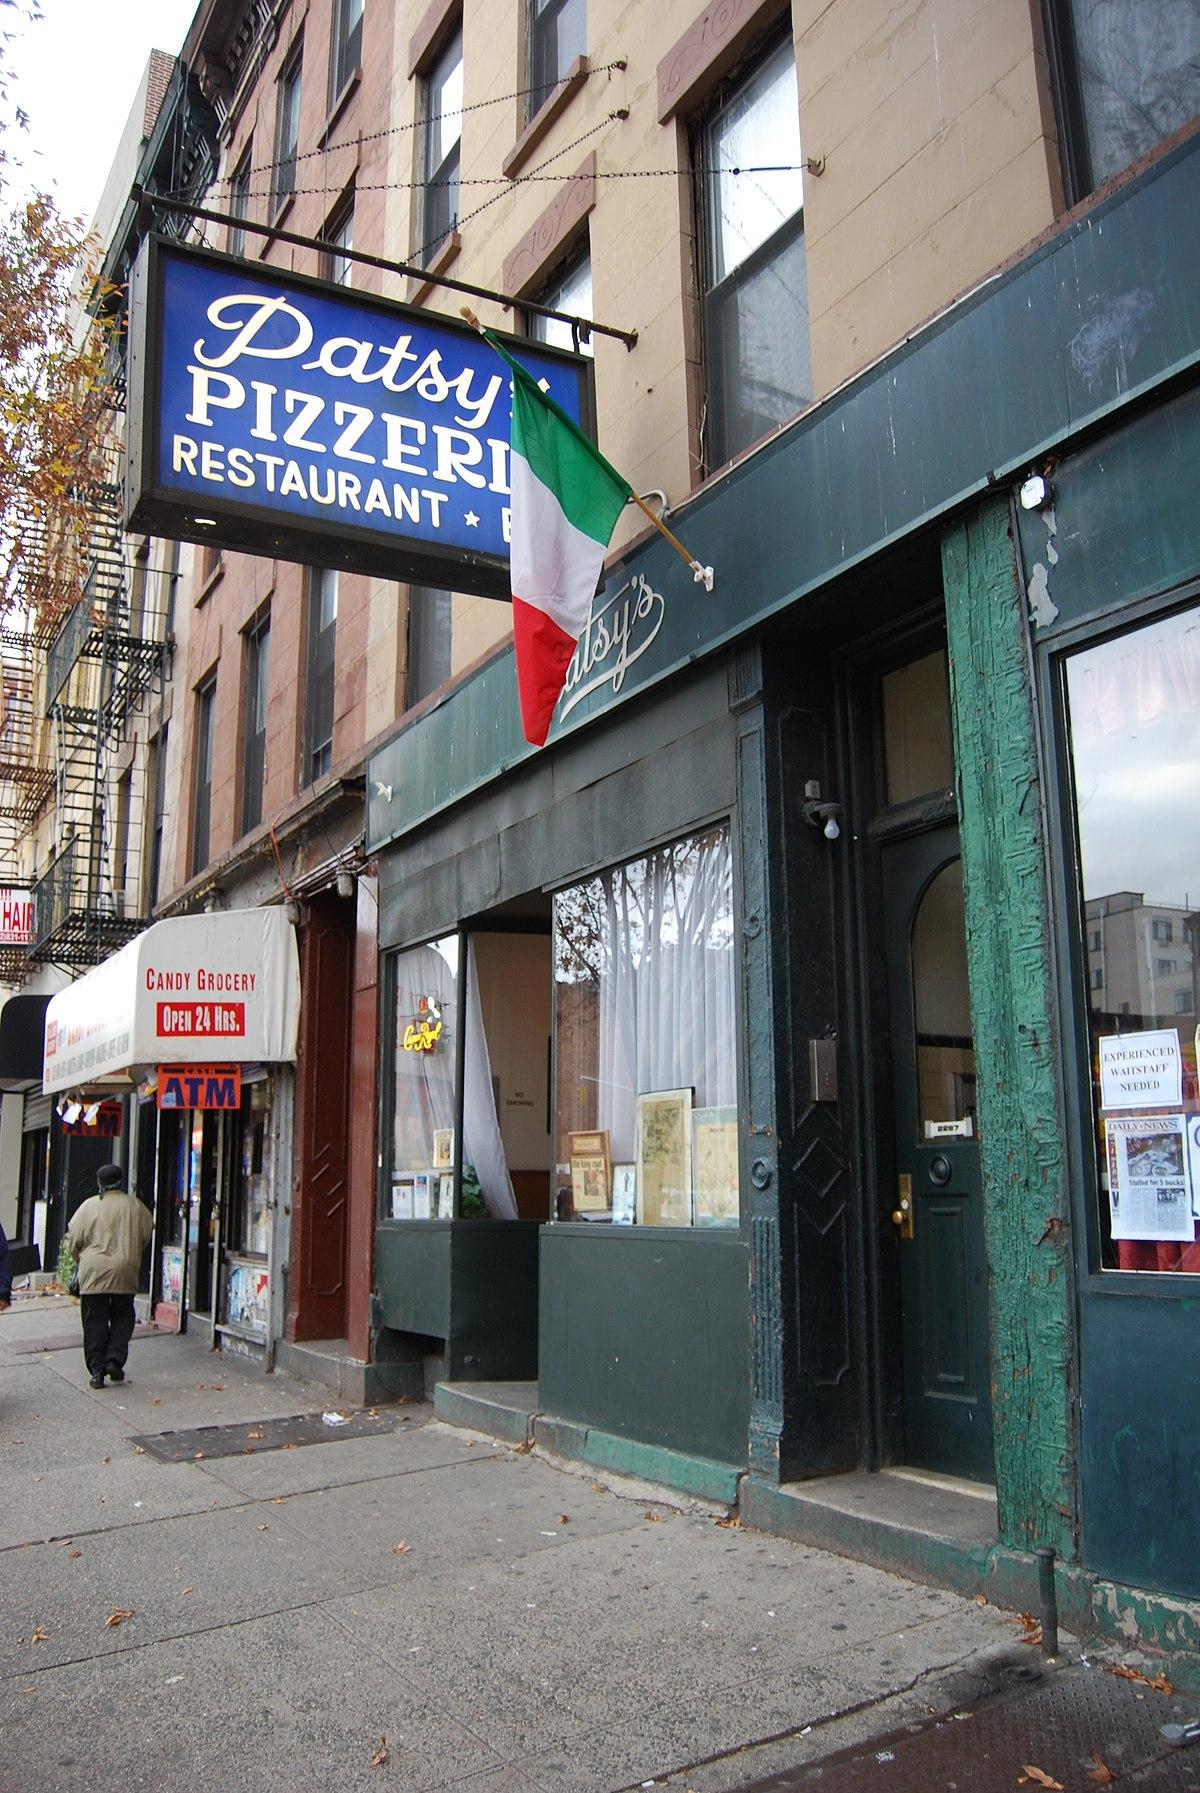 Pizzeria City Hotel Michelstadt